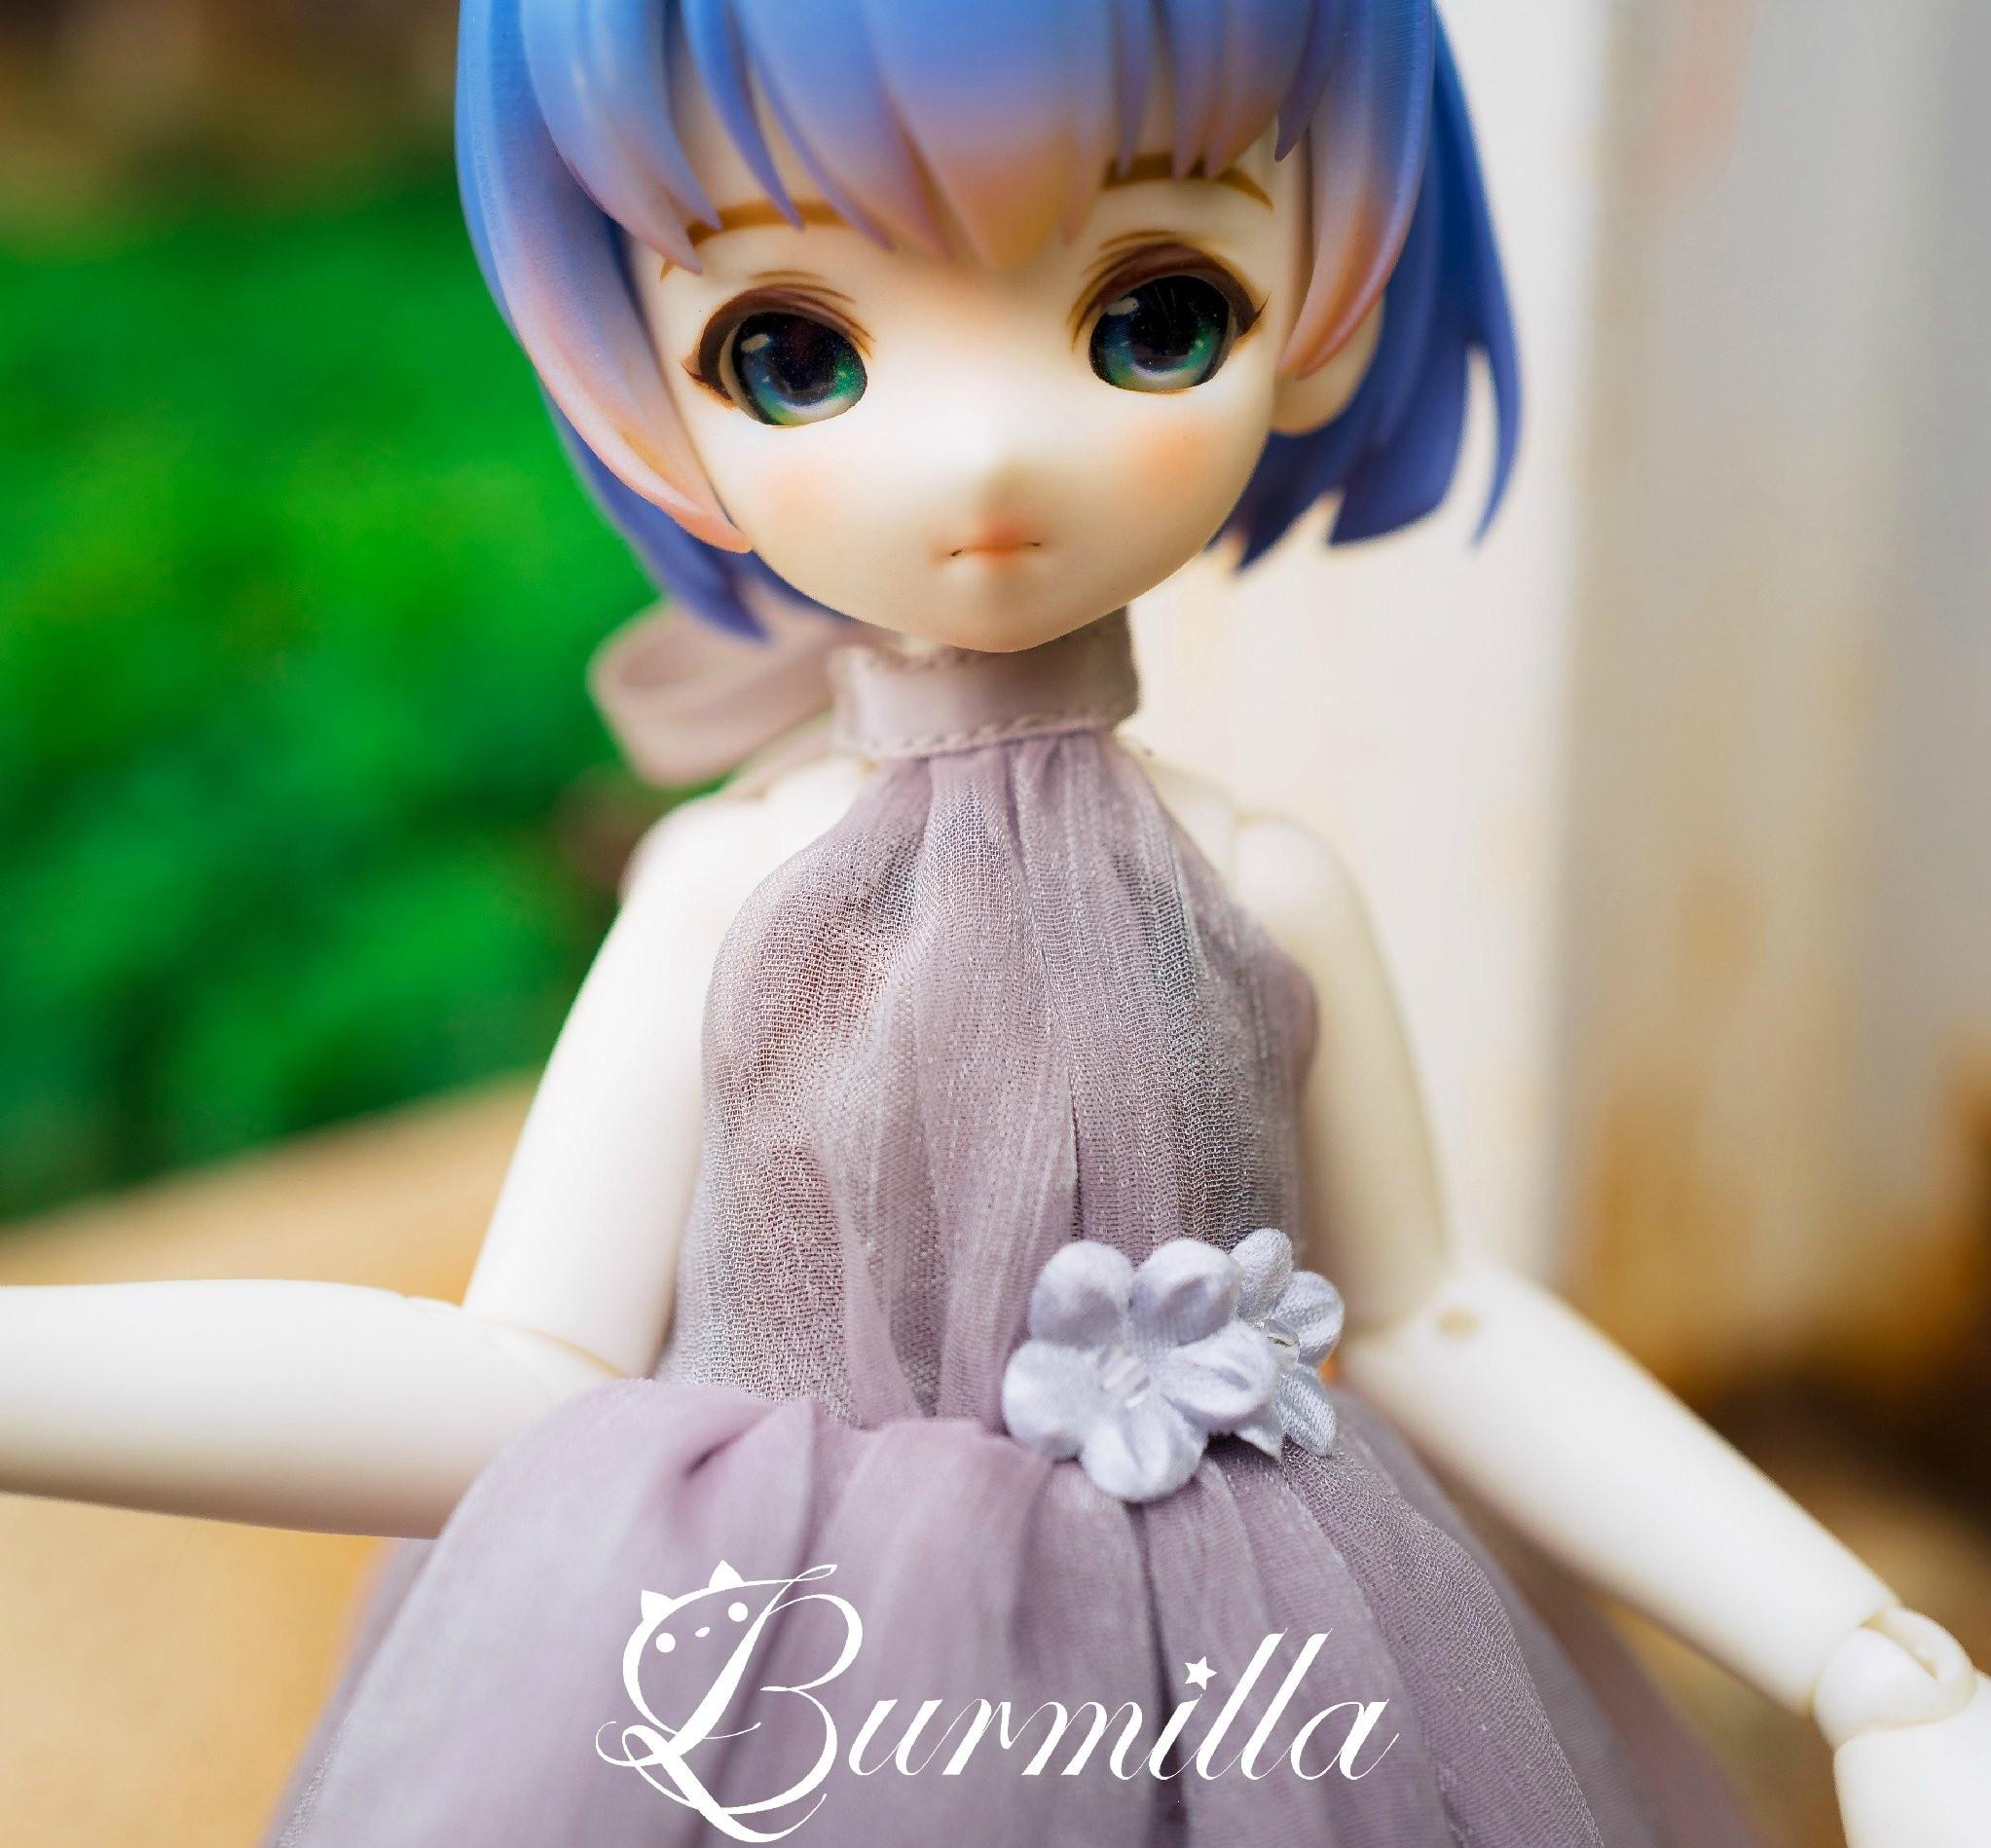 SIO2-burmilla-1.jpg